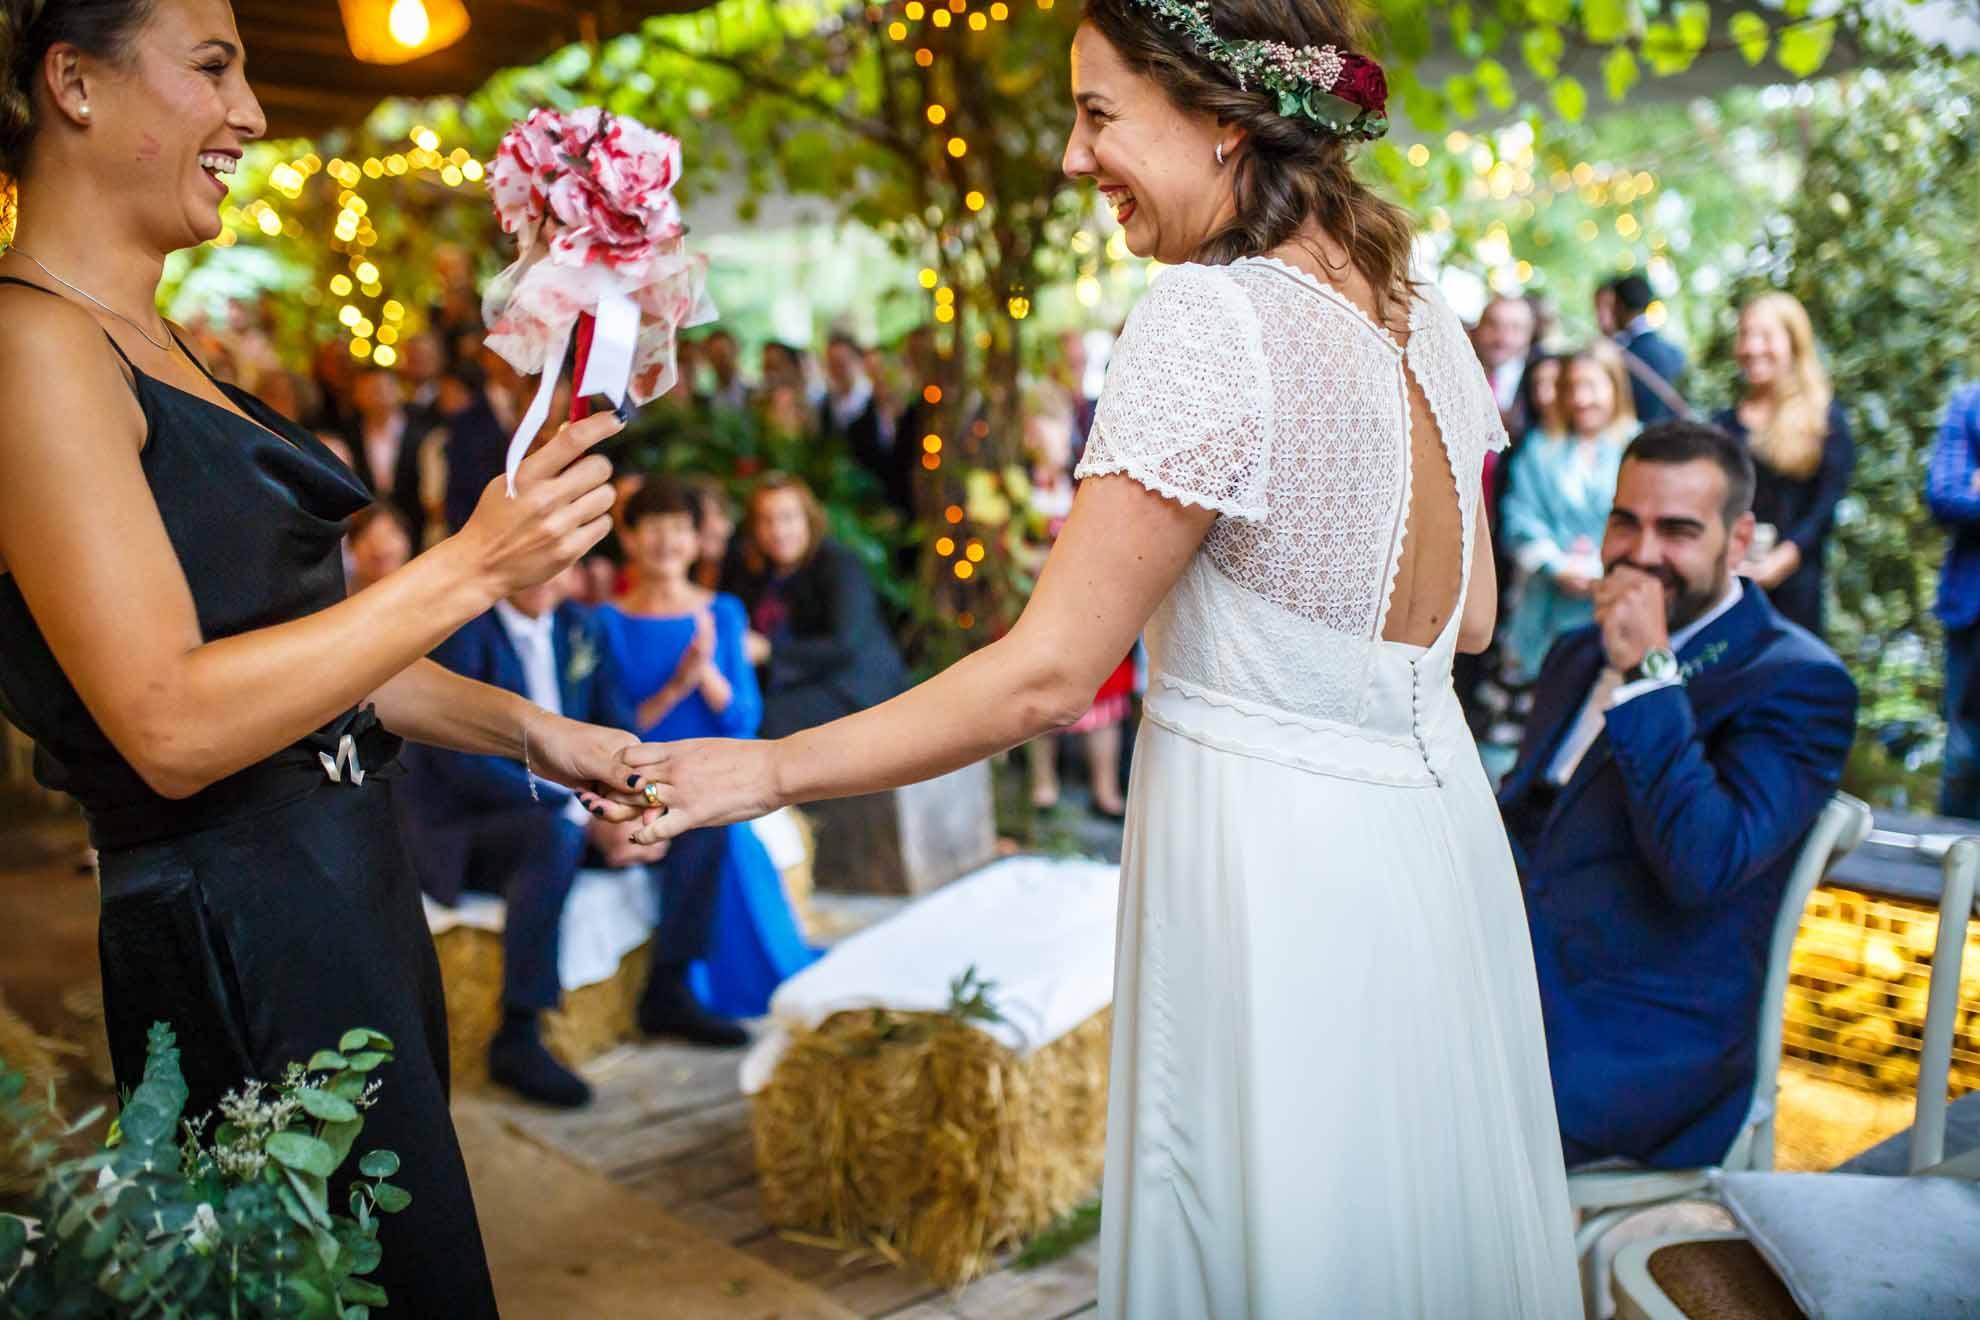 amiga le da un ramo de plastico a la novia